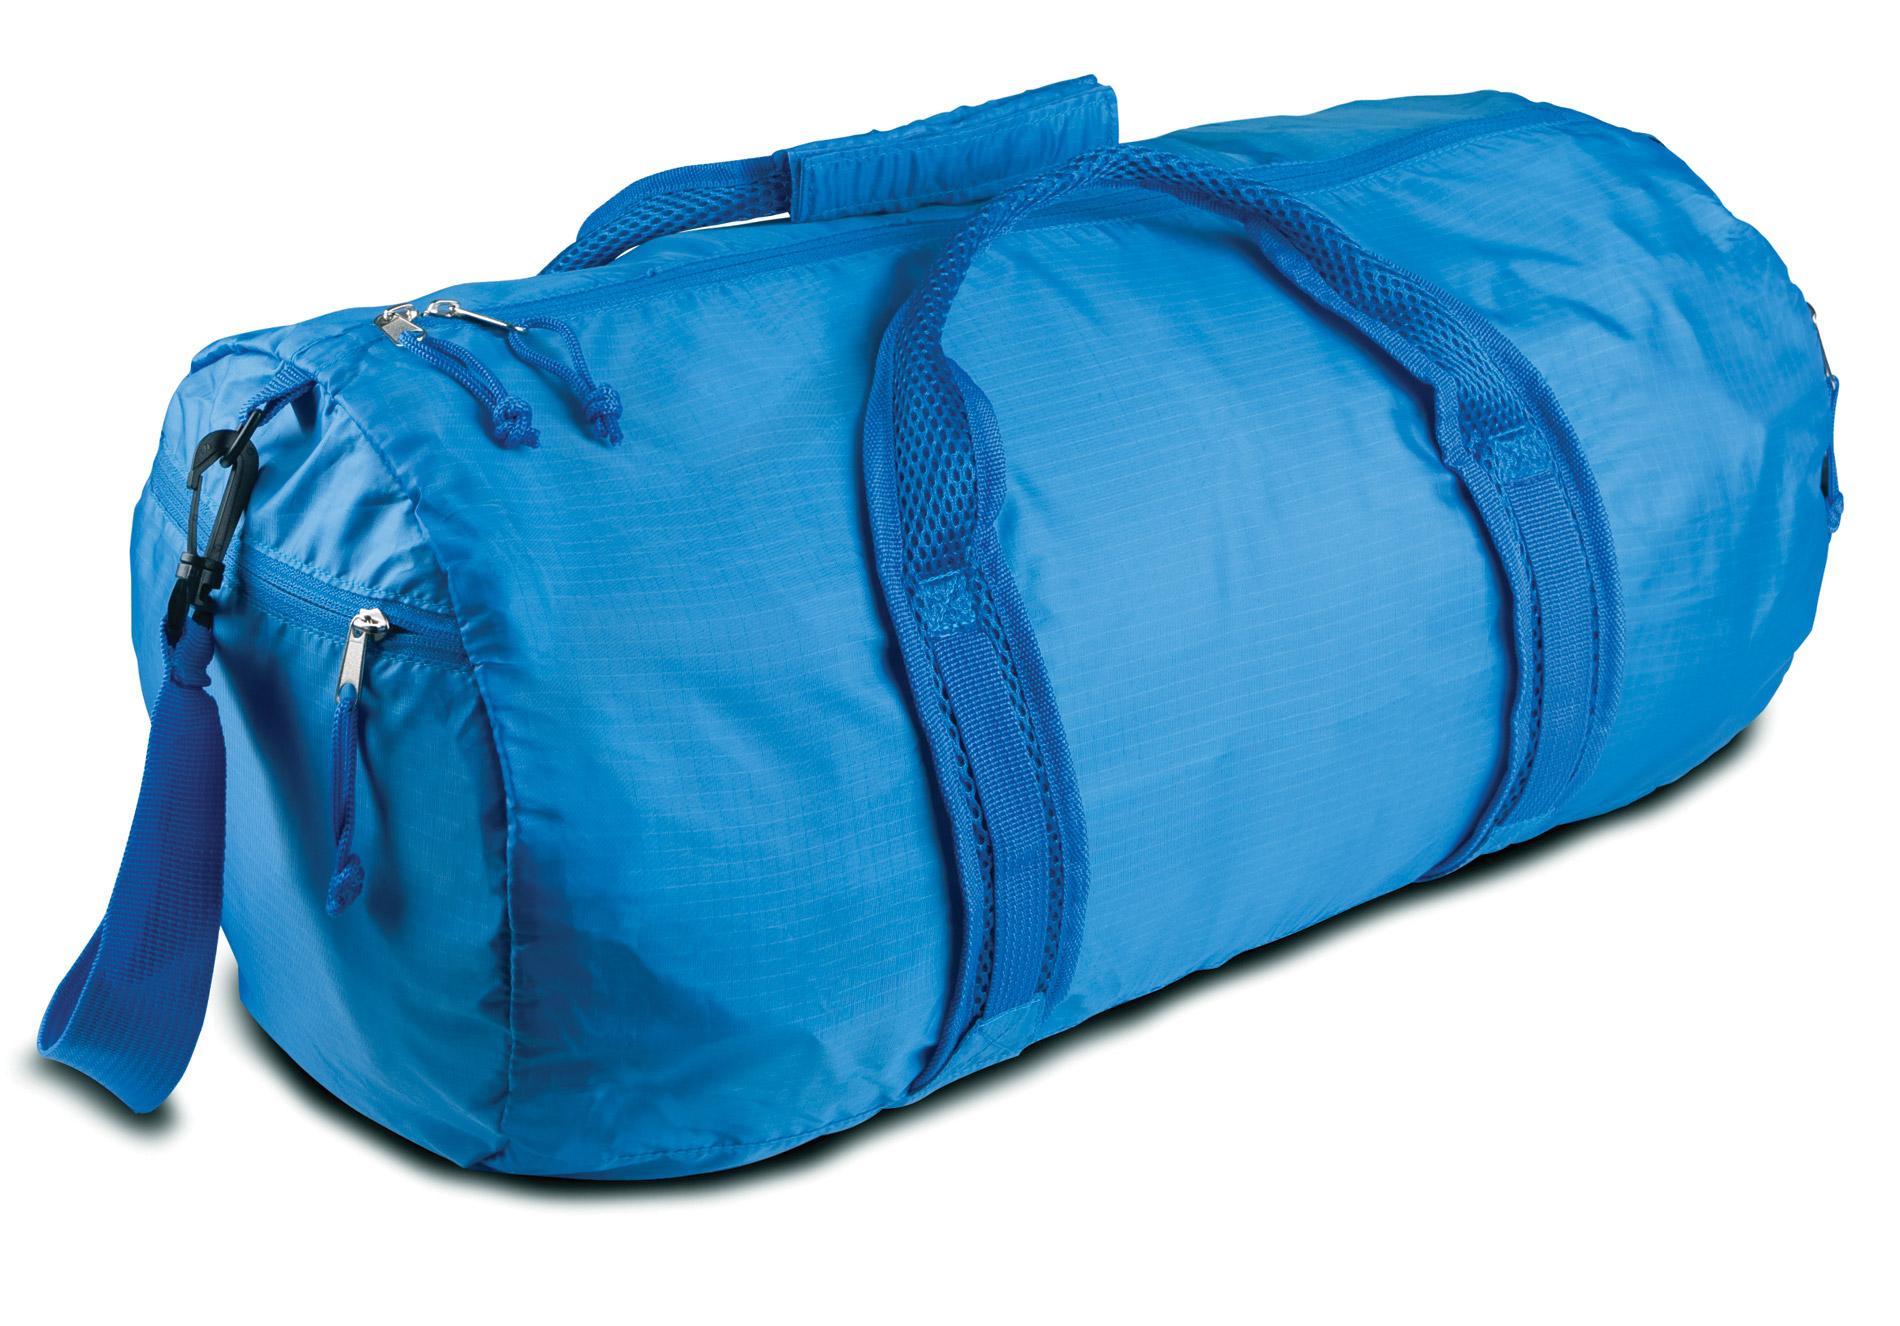 sporttas ki0605 Aquablauw